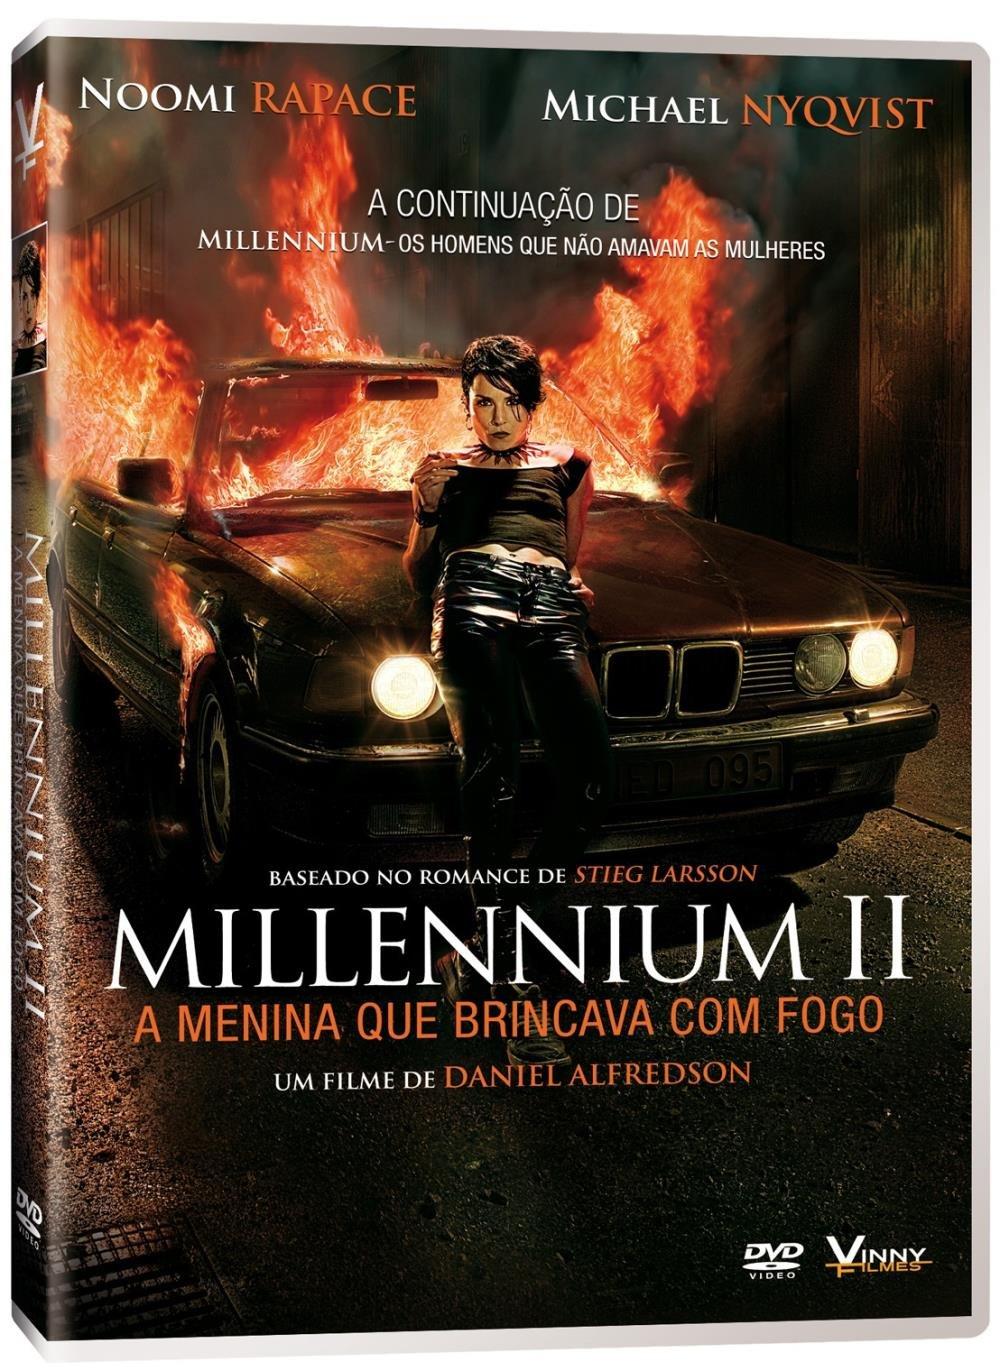 Millennium Ii A Menina Que Brincava Com Fogo Dvd Saraiva